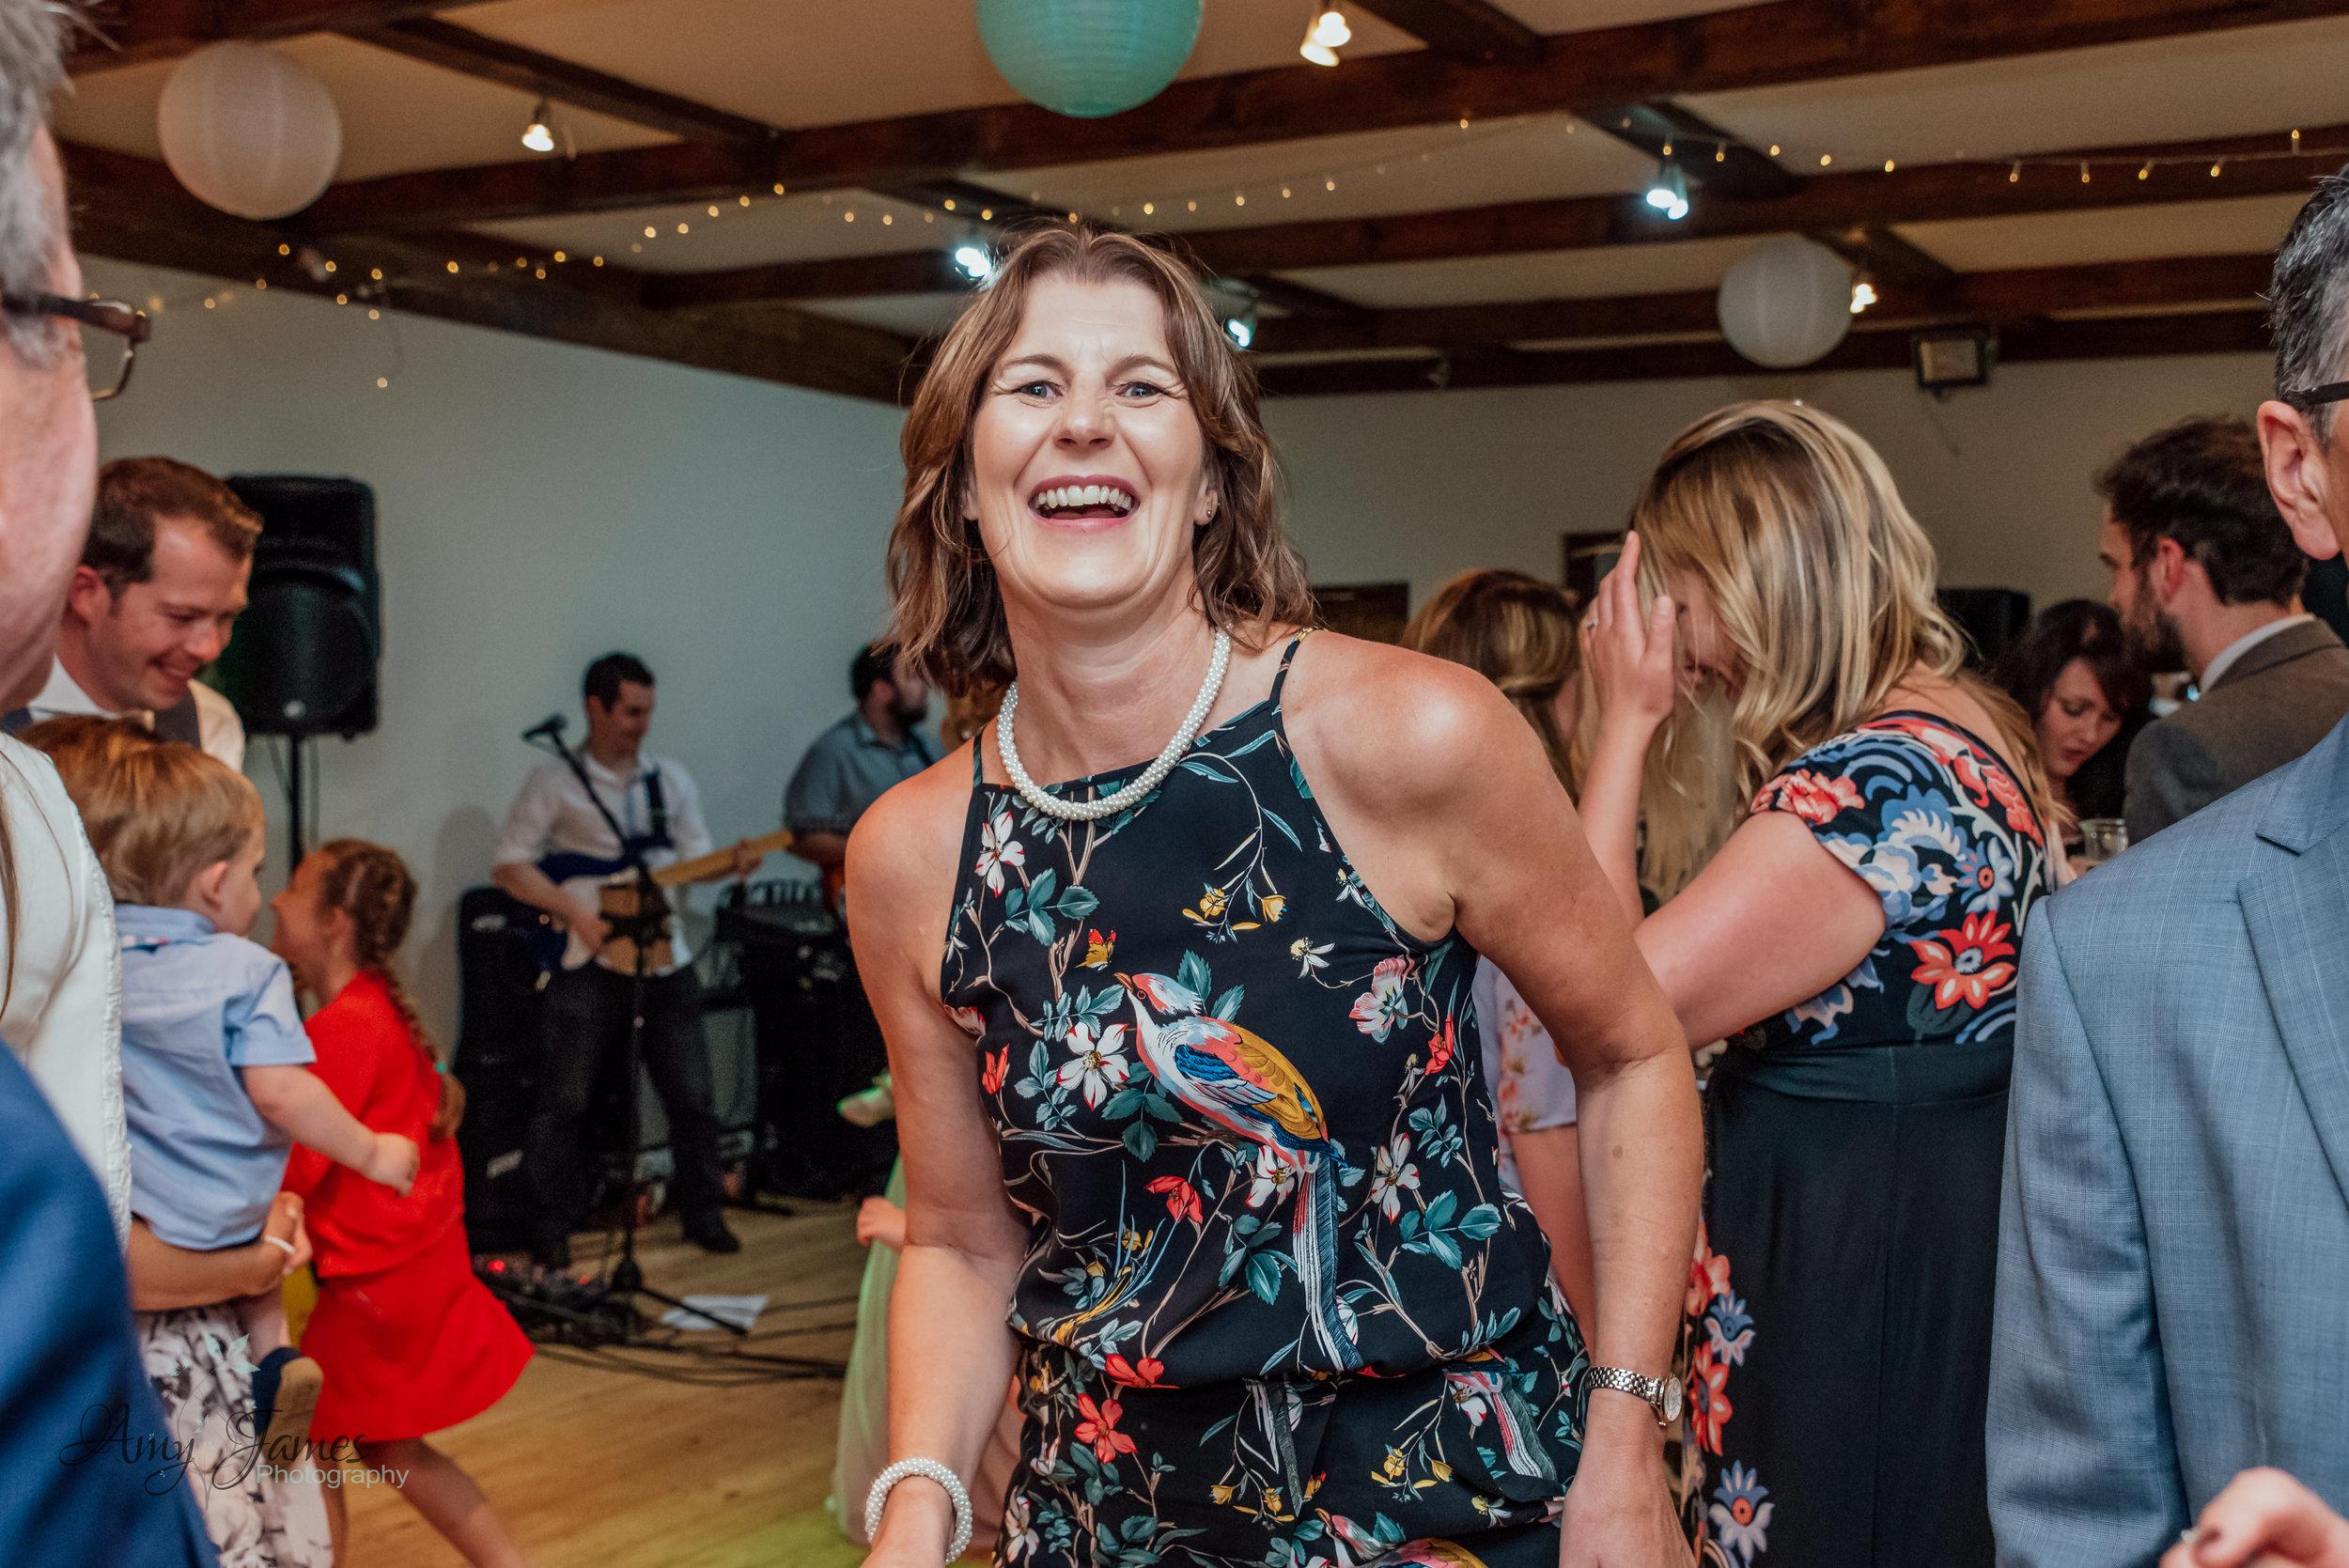 Taplins Place Wedding - Hampshire wedding Photographer - Fleet wedding photographer - Amy James Photography-103.jpg